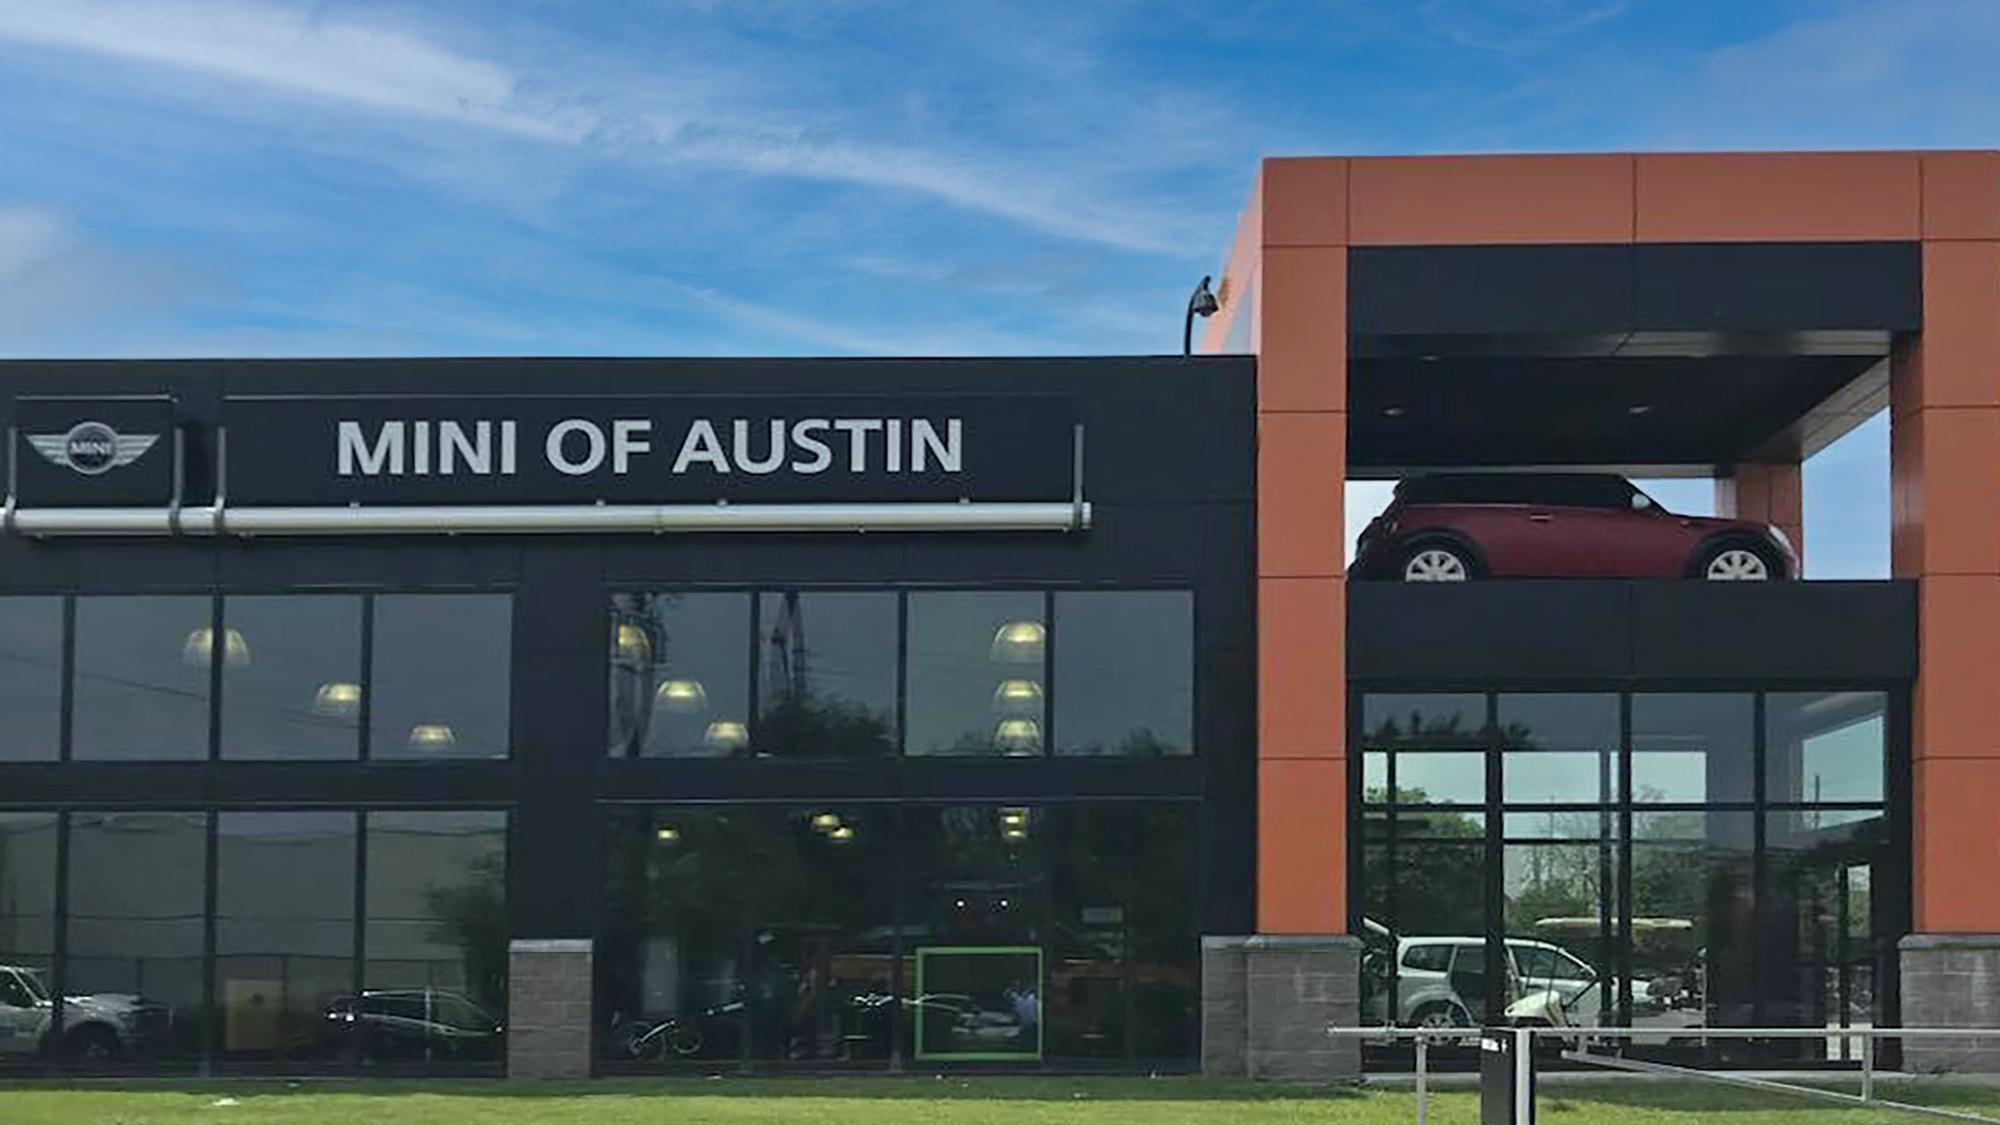 MINI of Austin Service Department